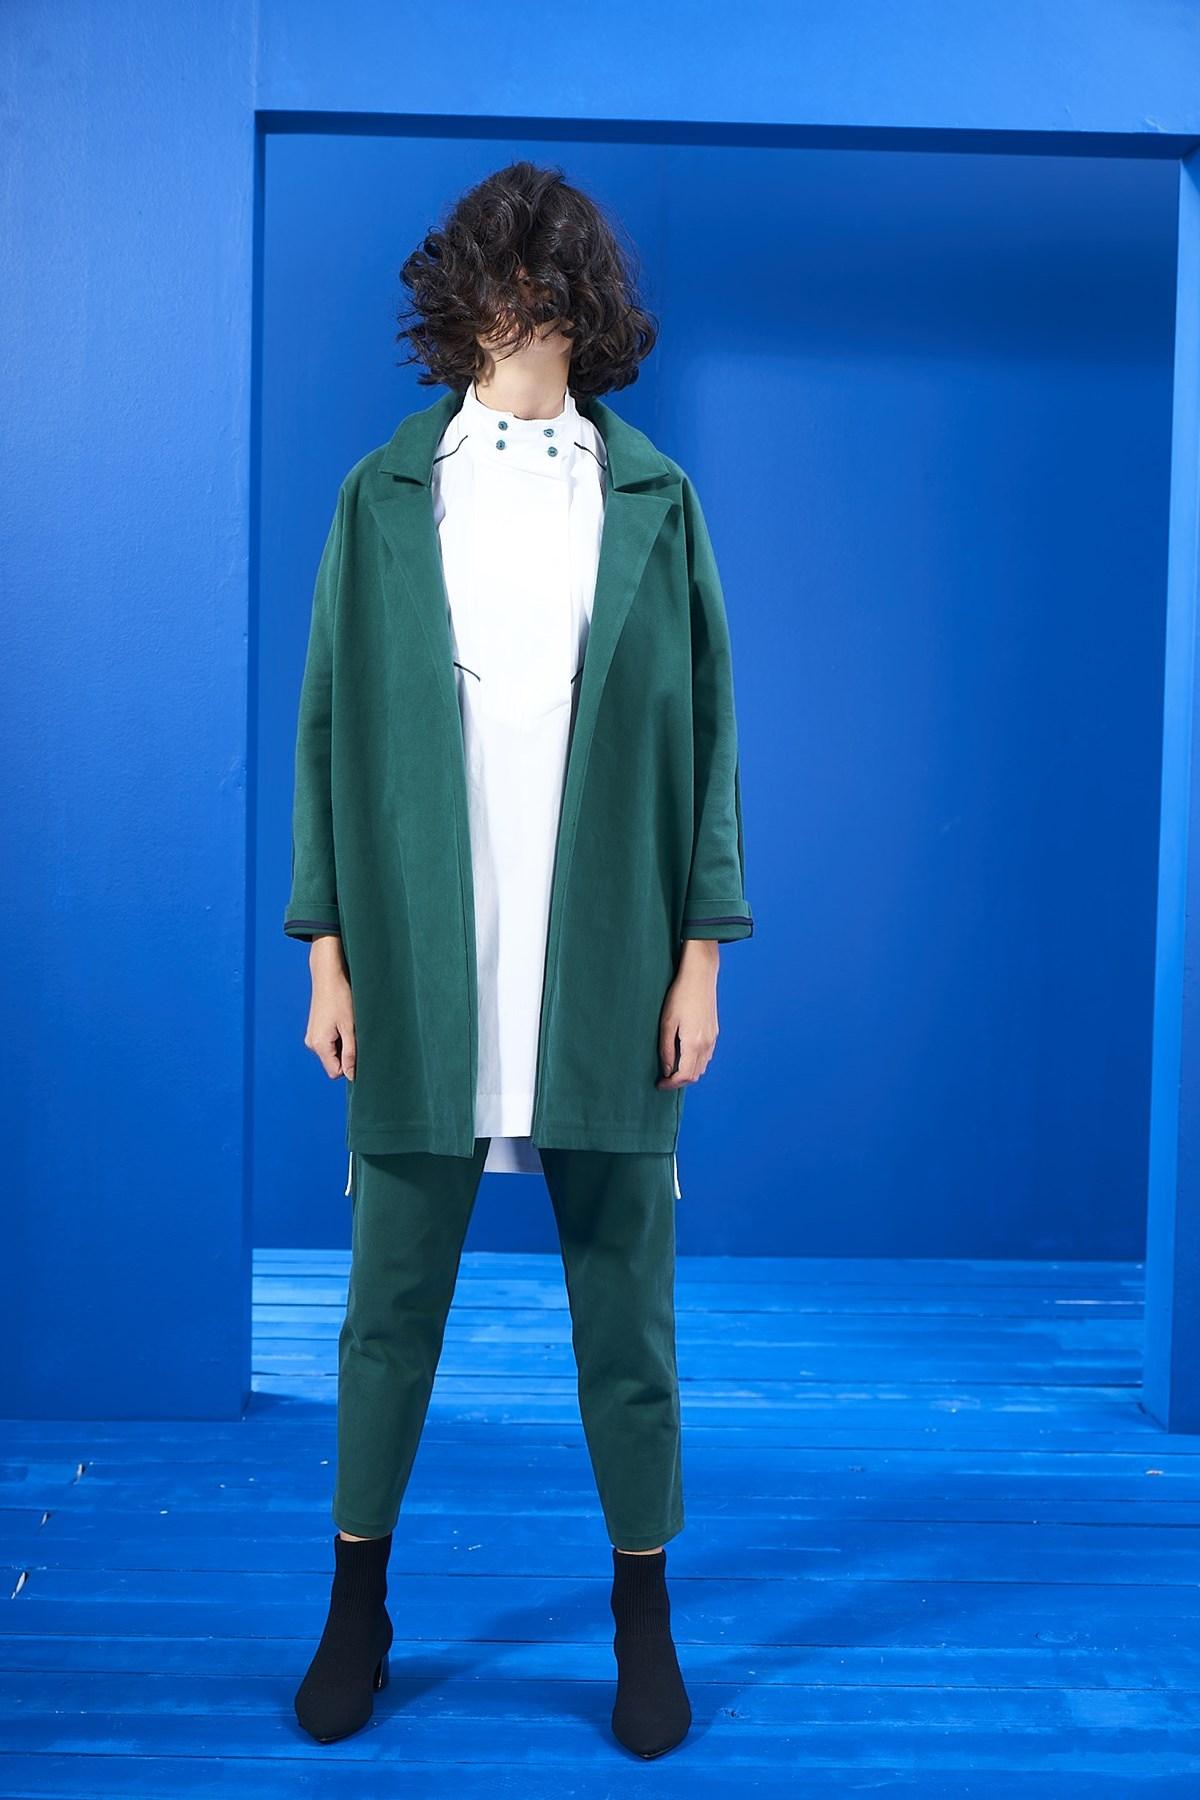 Mevra - Yeşil Nakış Detay Blazer Ceket